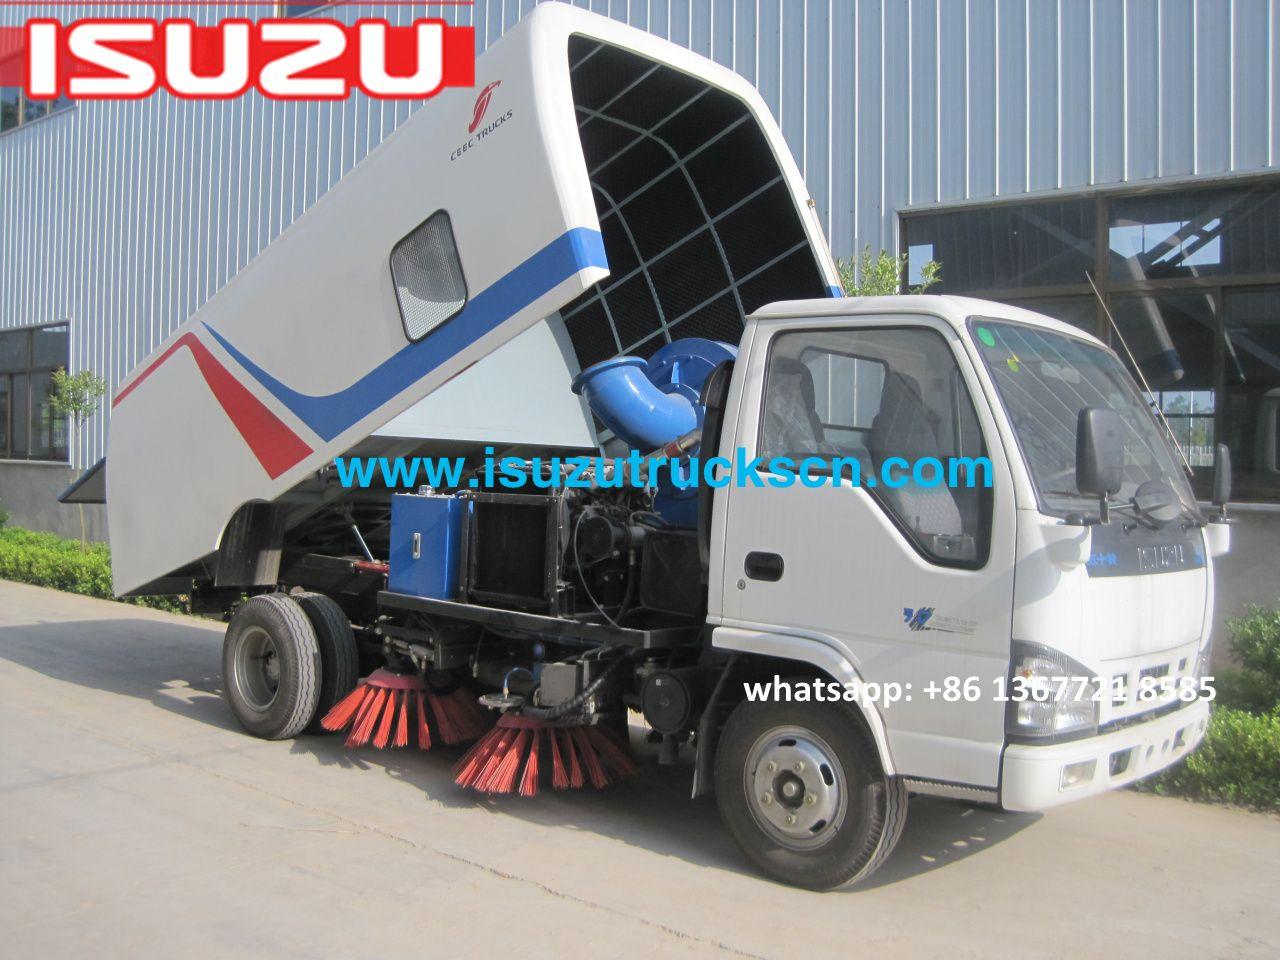 Isuzu 5m3 road sweeper machine philippines truck mounted sweeper http www isuzutruckscn